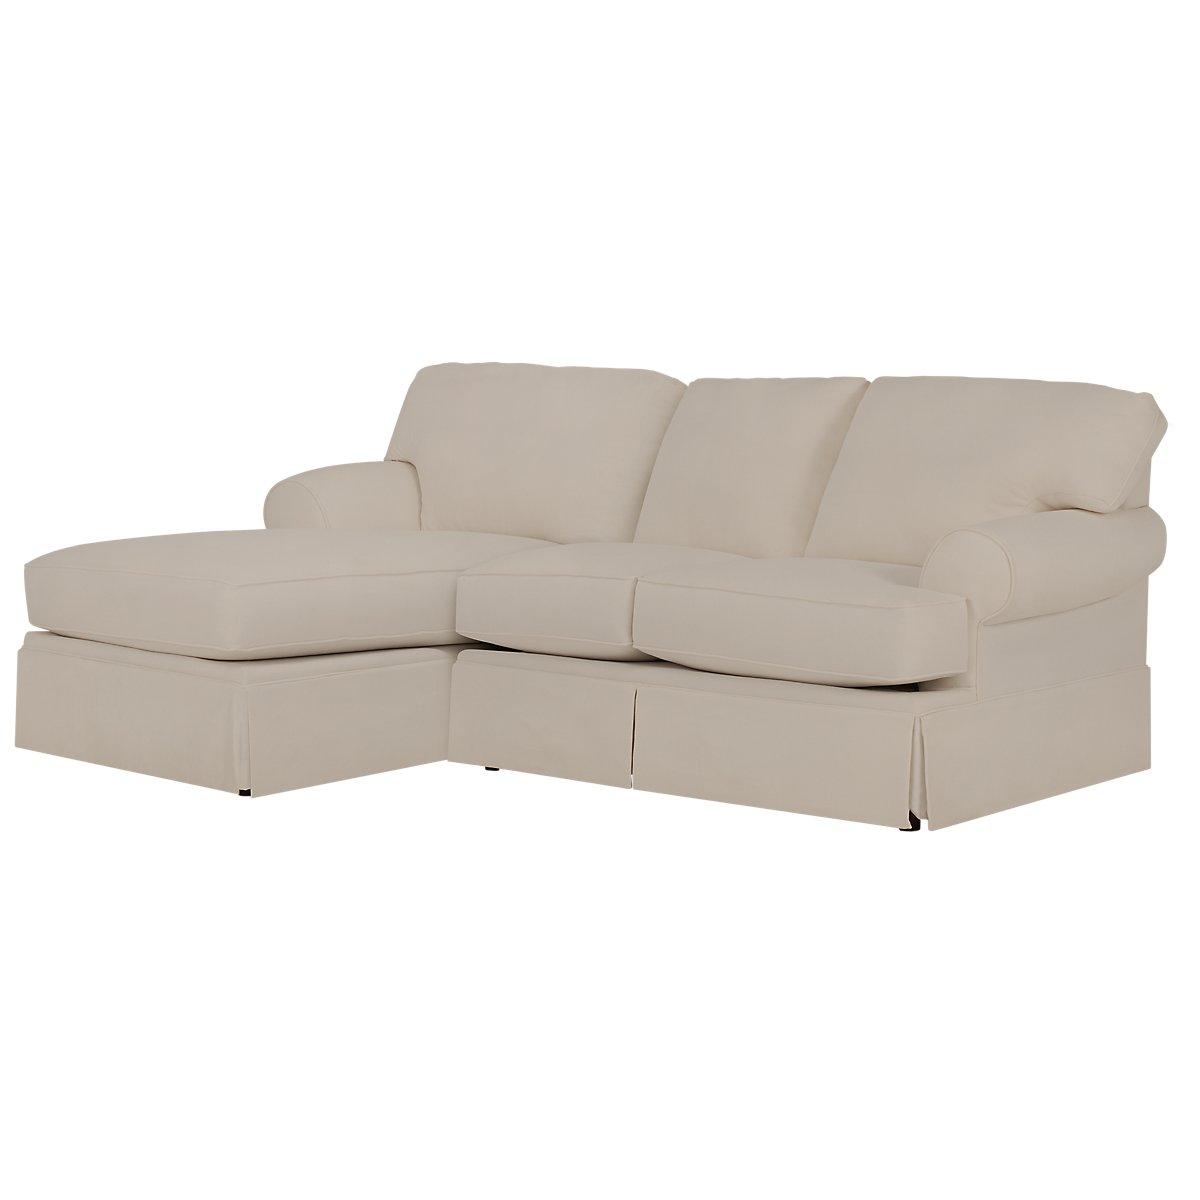 City furniture turner khaki fabric left chaise sectional for Chaise kaki